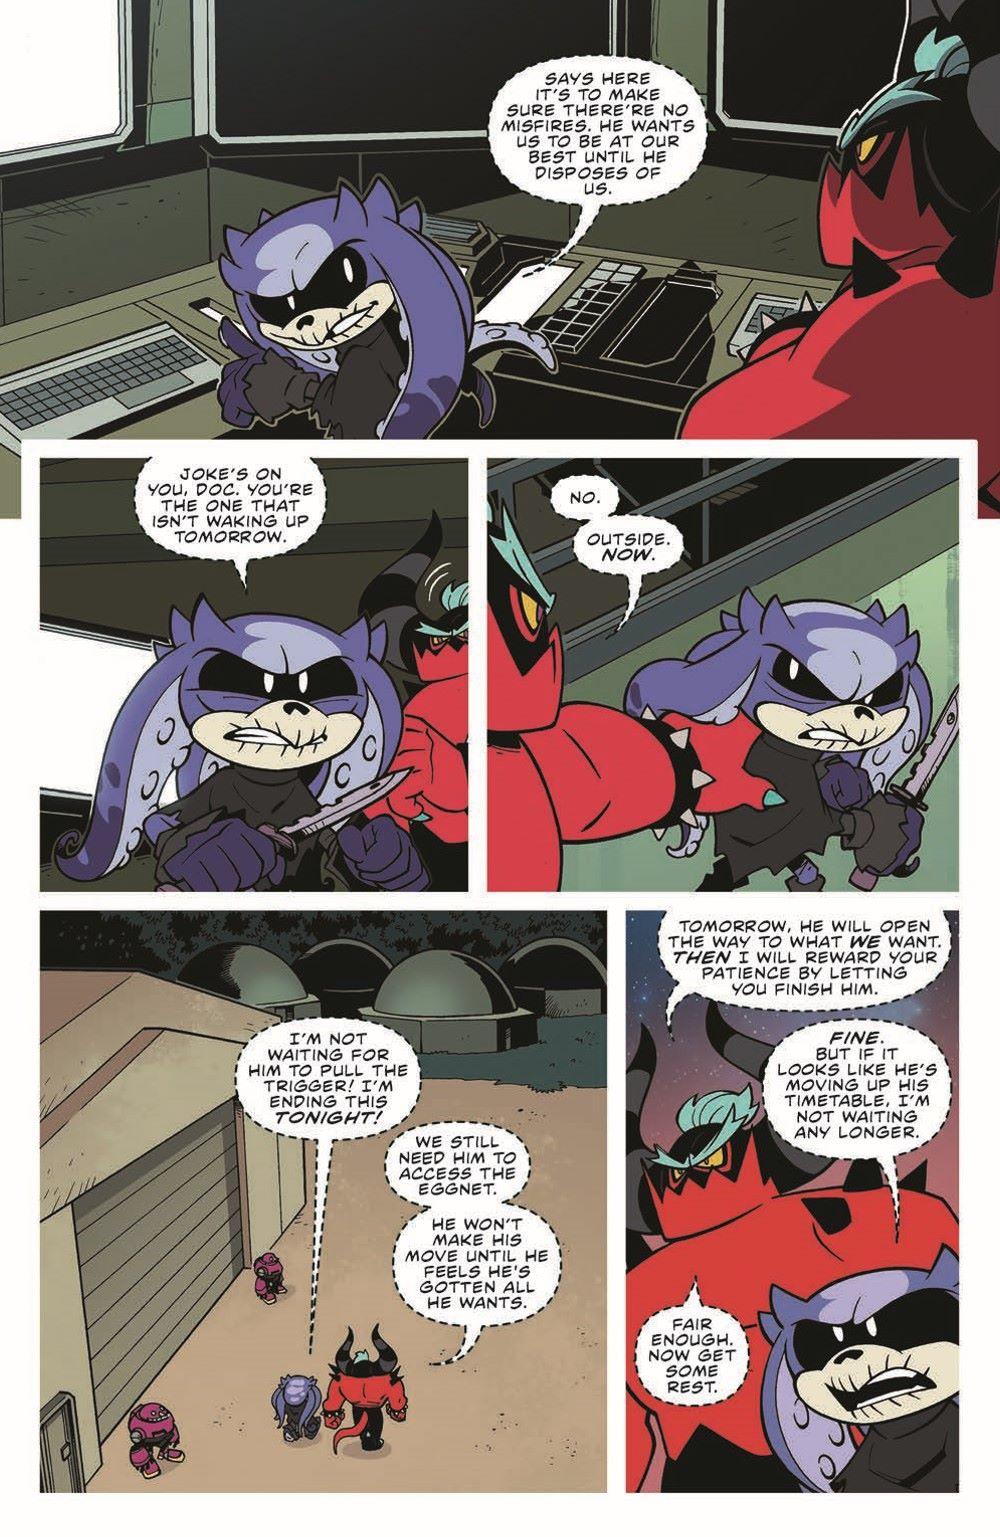 STH-BG03_pr-7 ComicList Previews: SONIC THE HEDGEHOG BAD GUYS #3 (OF 4)